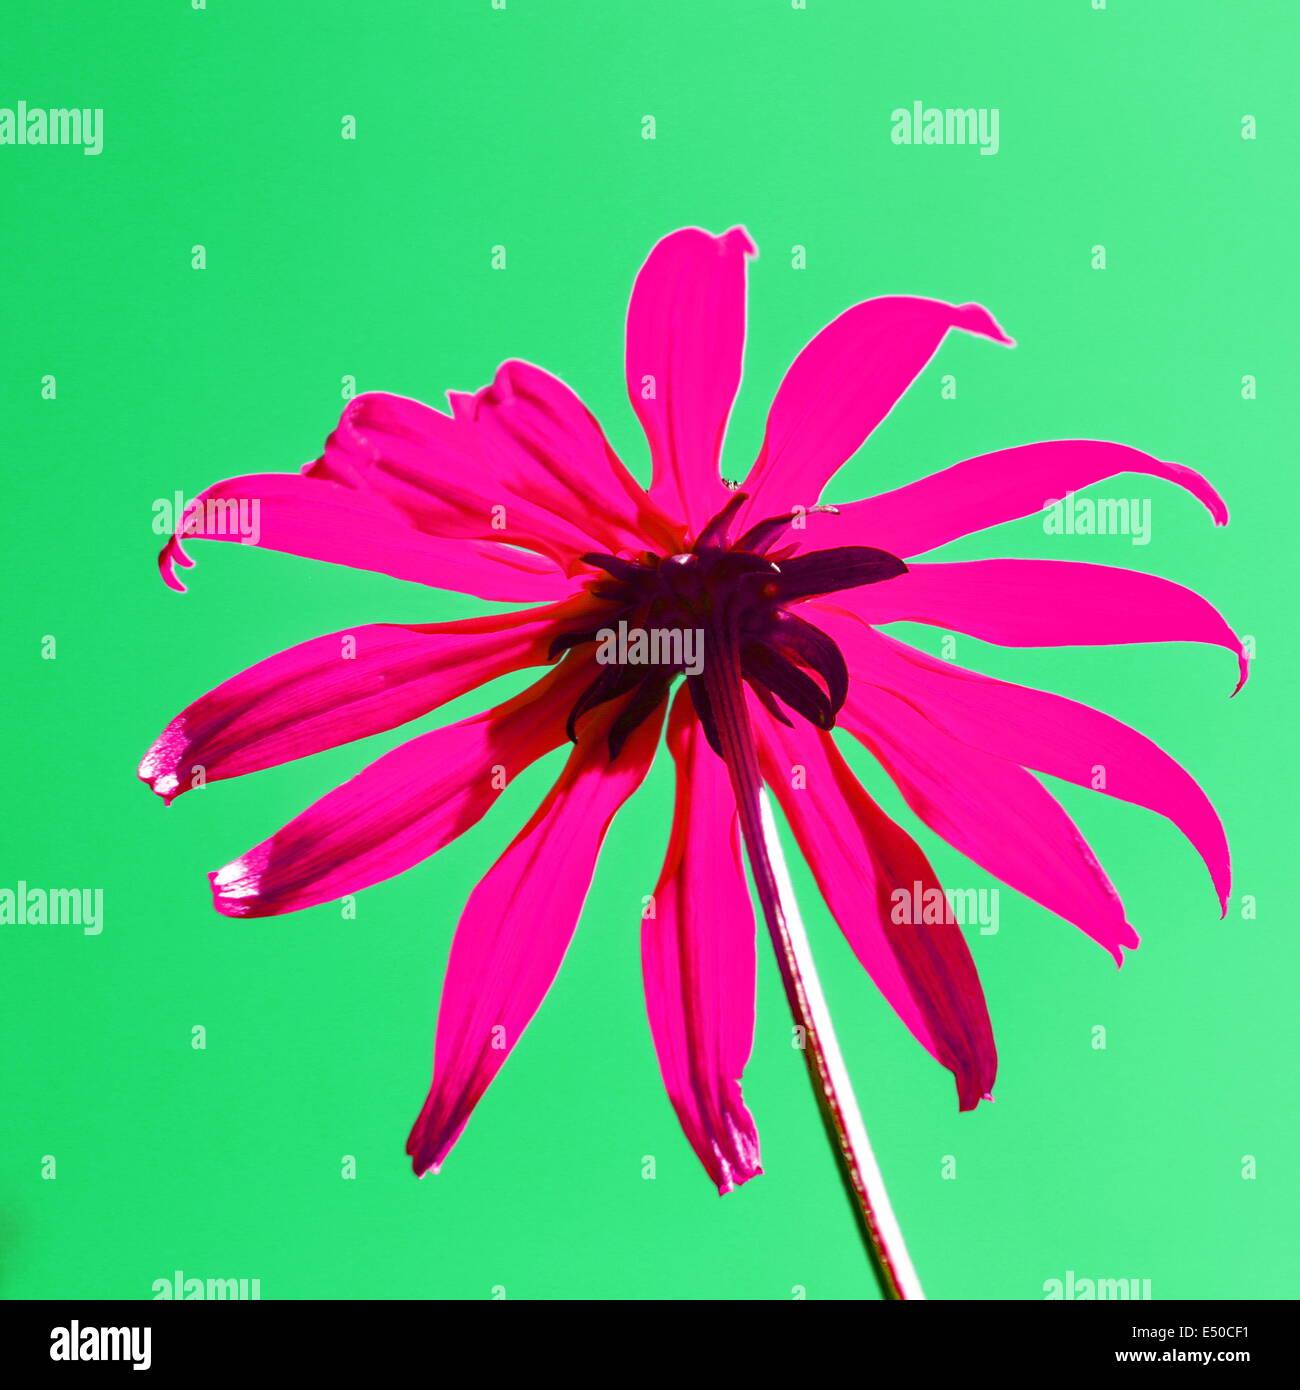 Sonnenhut - Stock Image